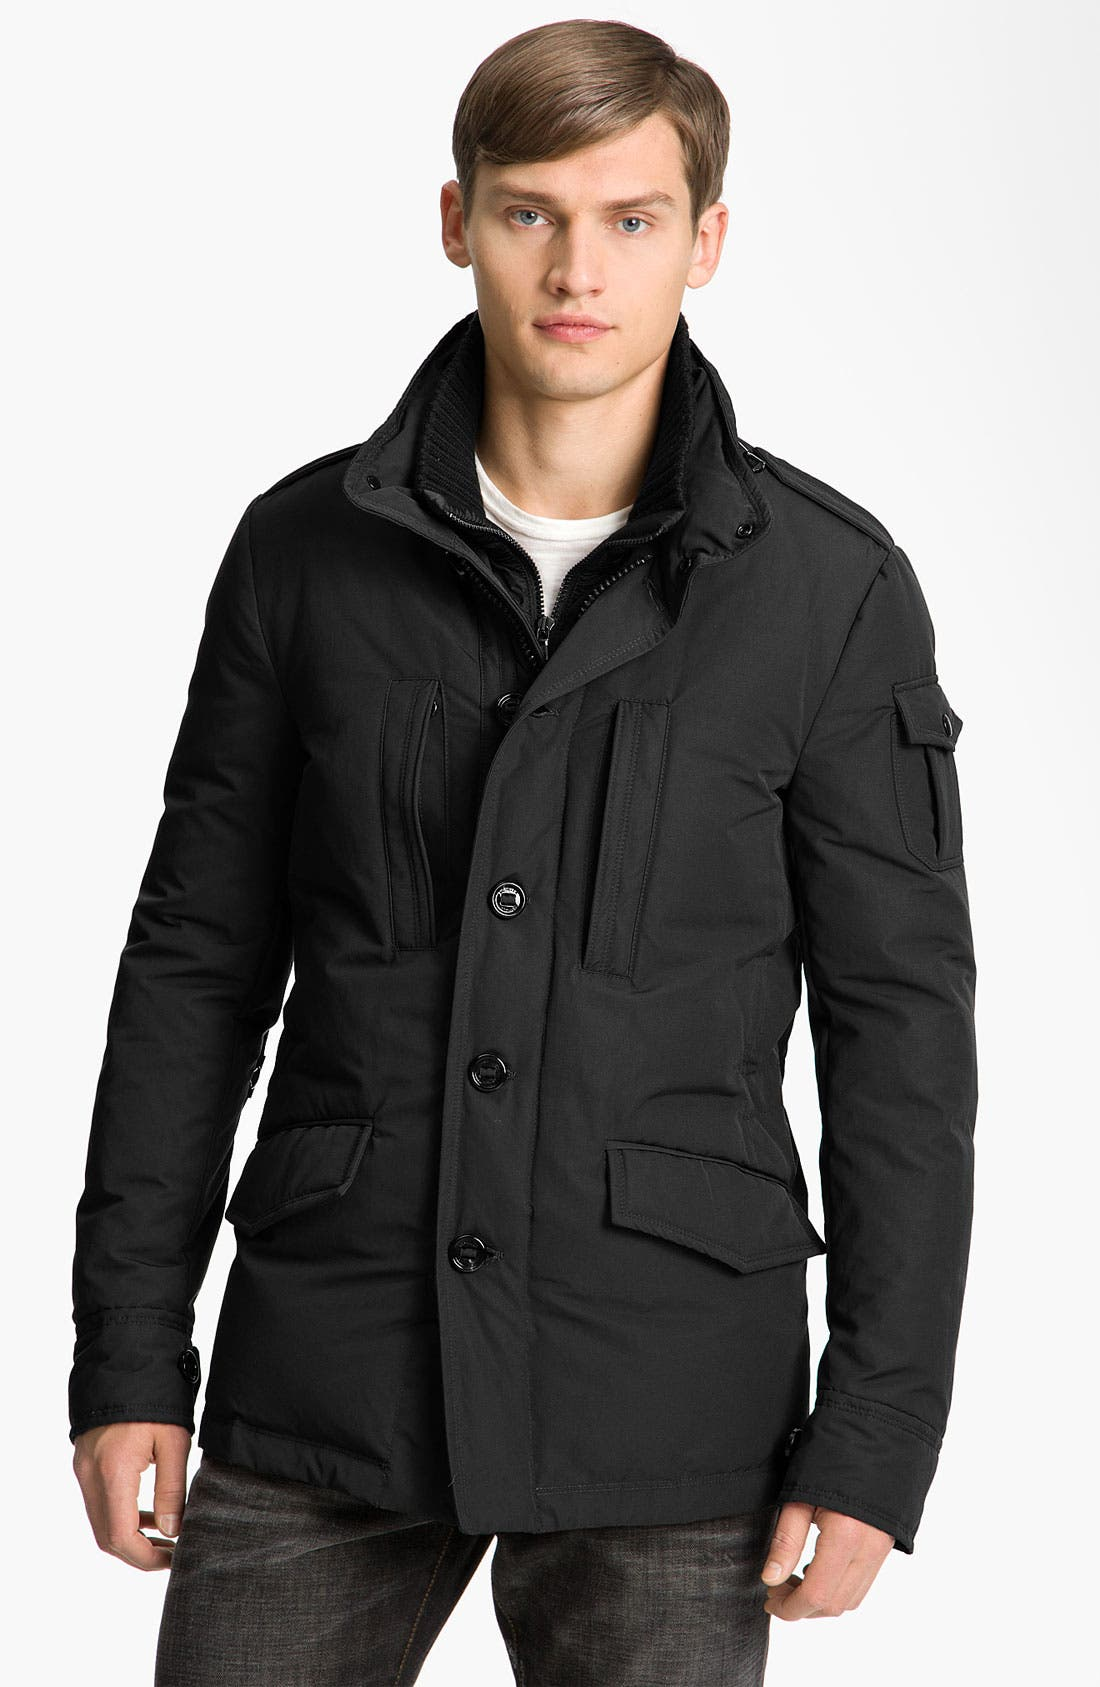 Main Image - Moncler 'Triomphe' Jacket